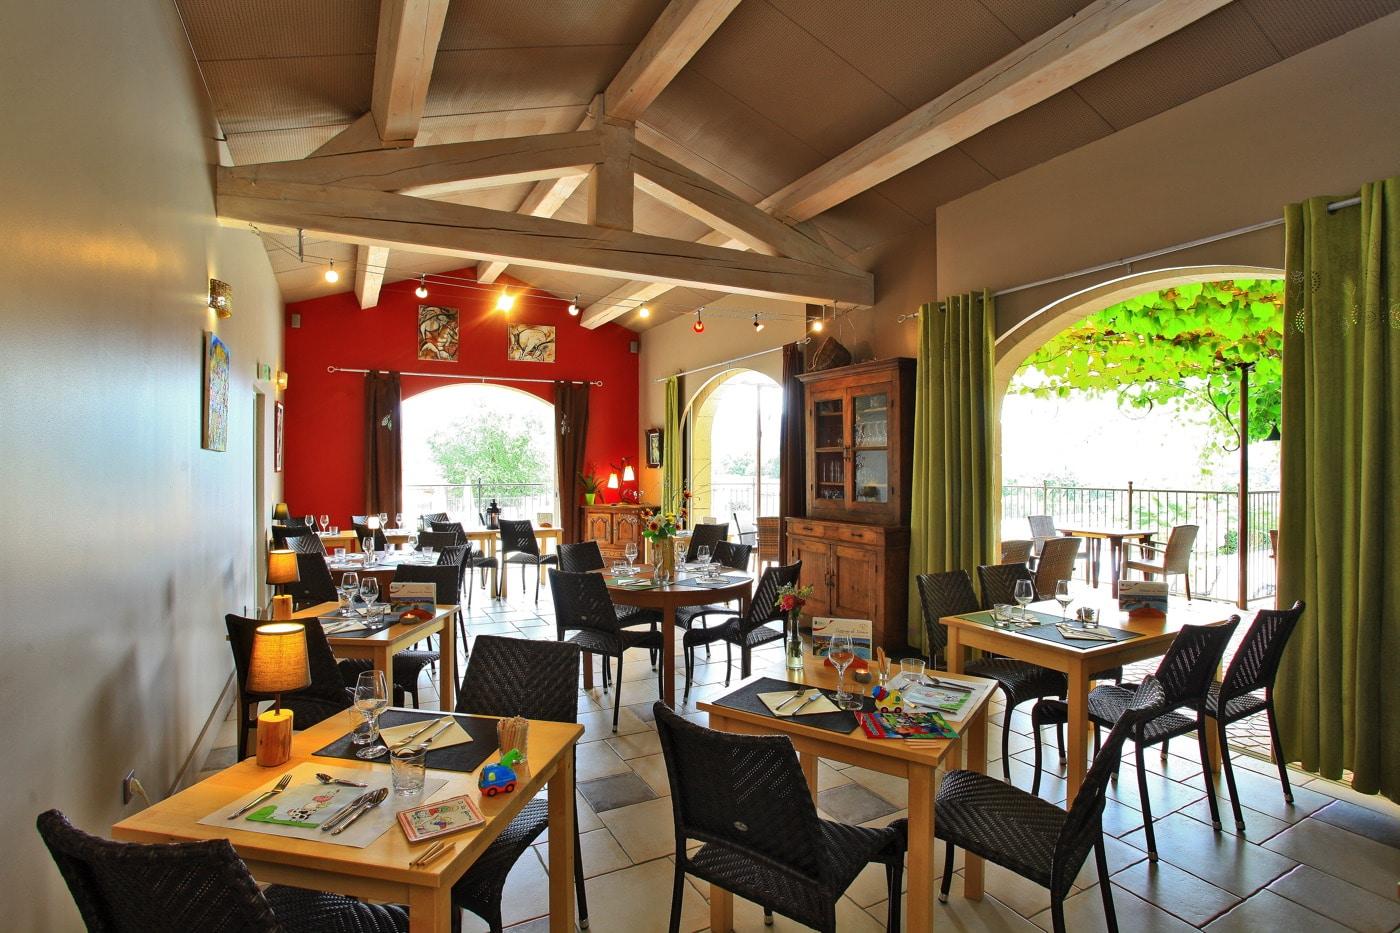 domaine sevenier camping 5 etoiles ardeche restaurant galerie photo16 - domaine-sevenier-camping-5-etoiles-ardeche-restaurant-galerie-photo16